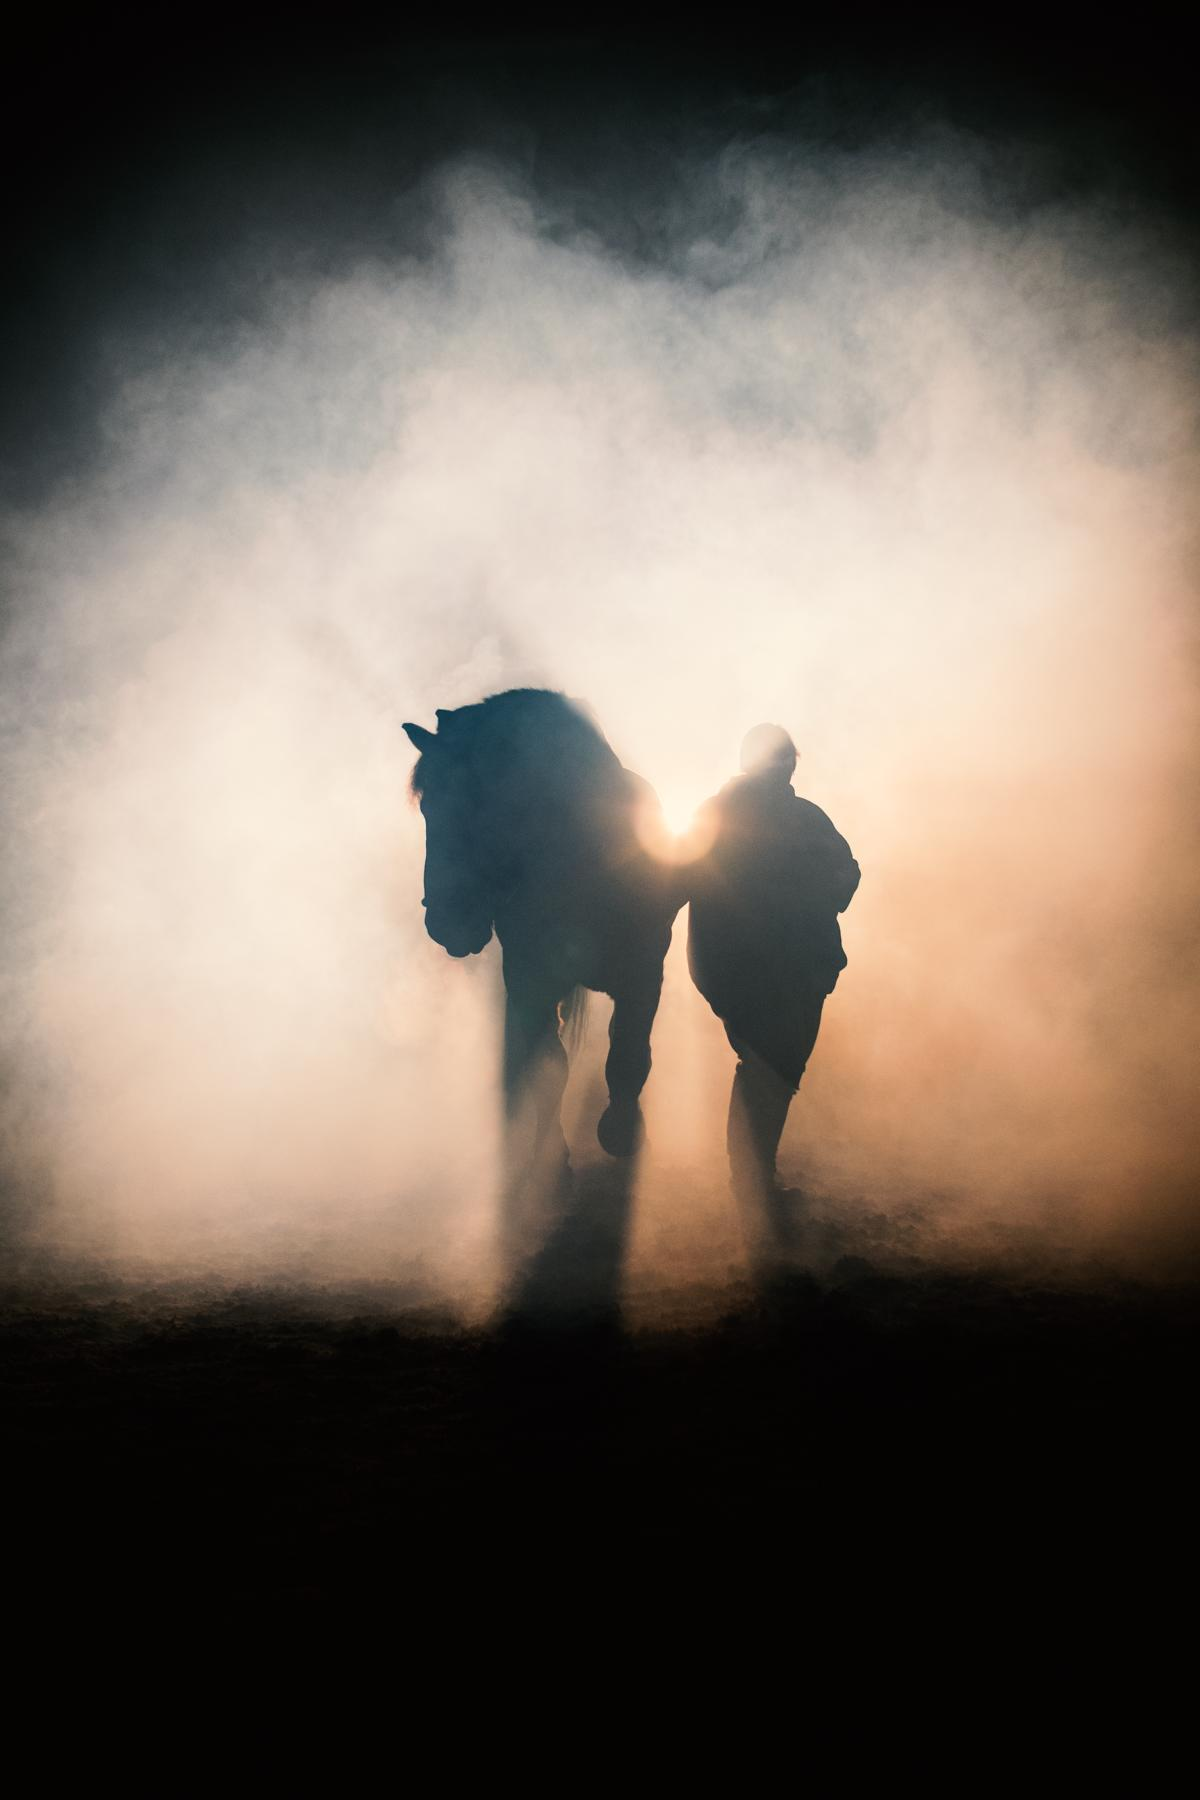 Kaltblut Freundschaft Nebel Dunkelshooting